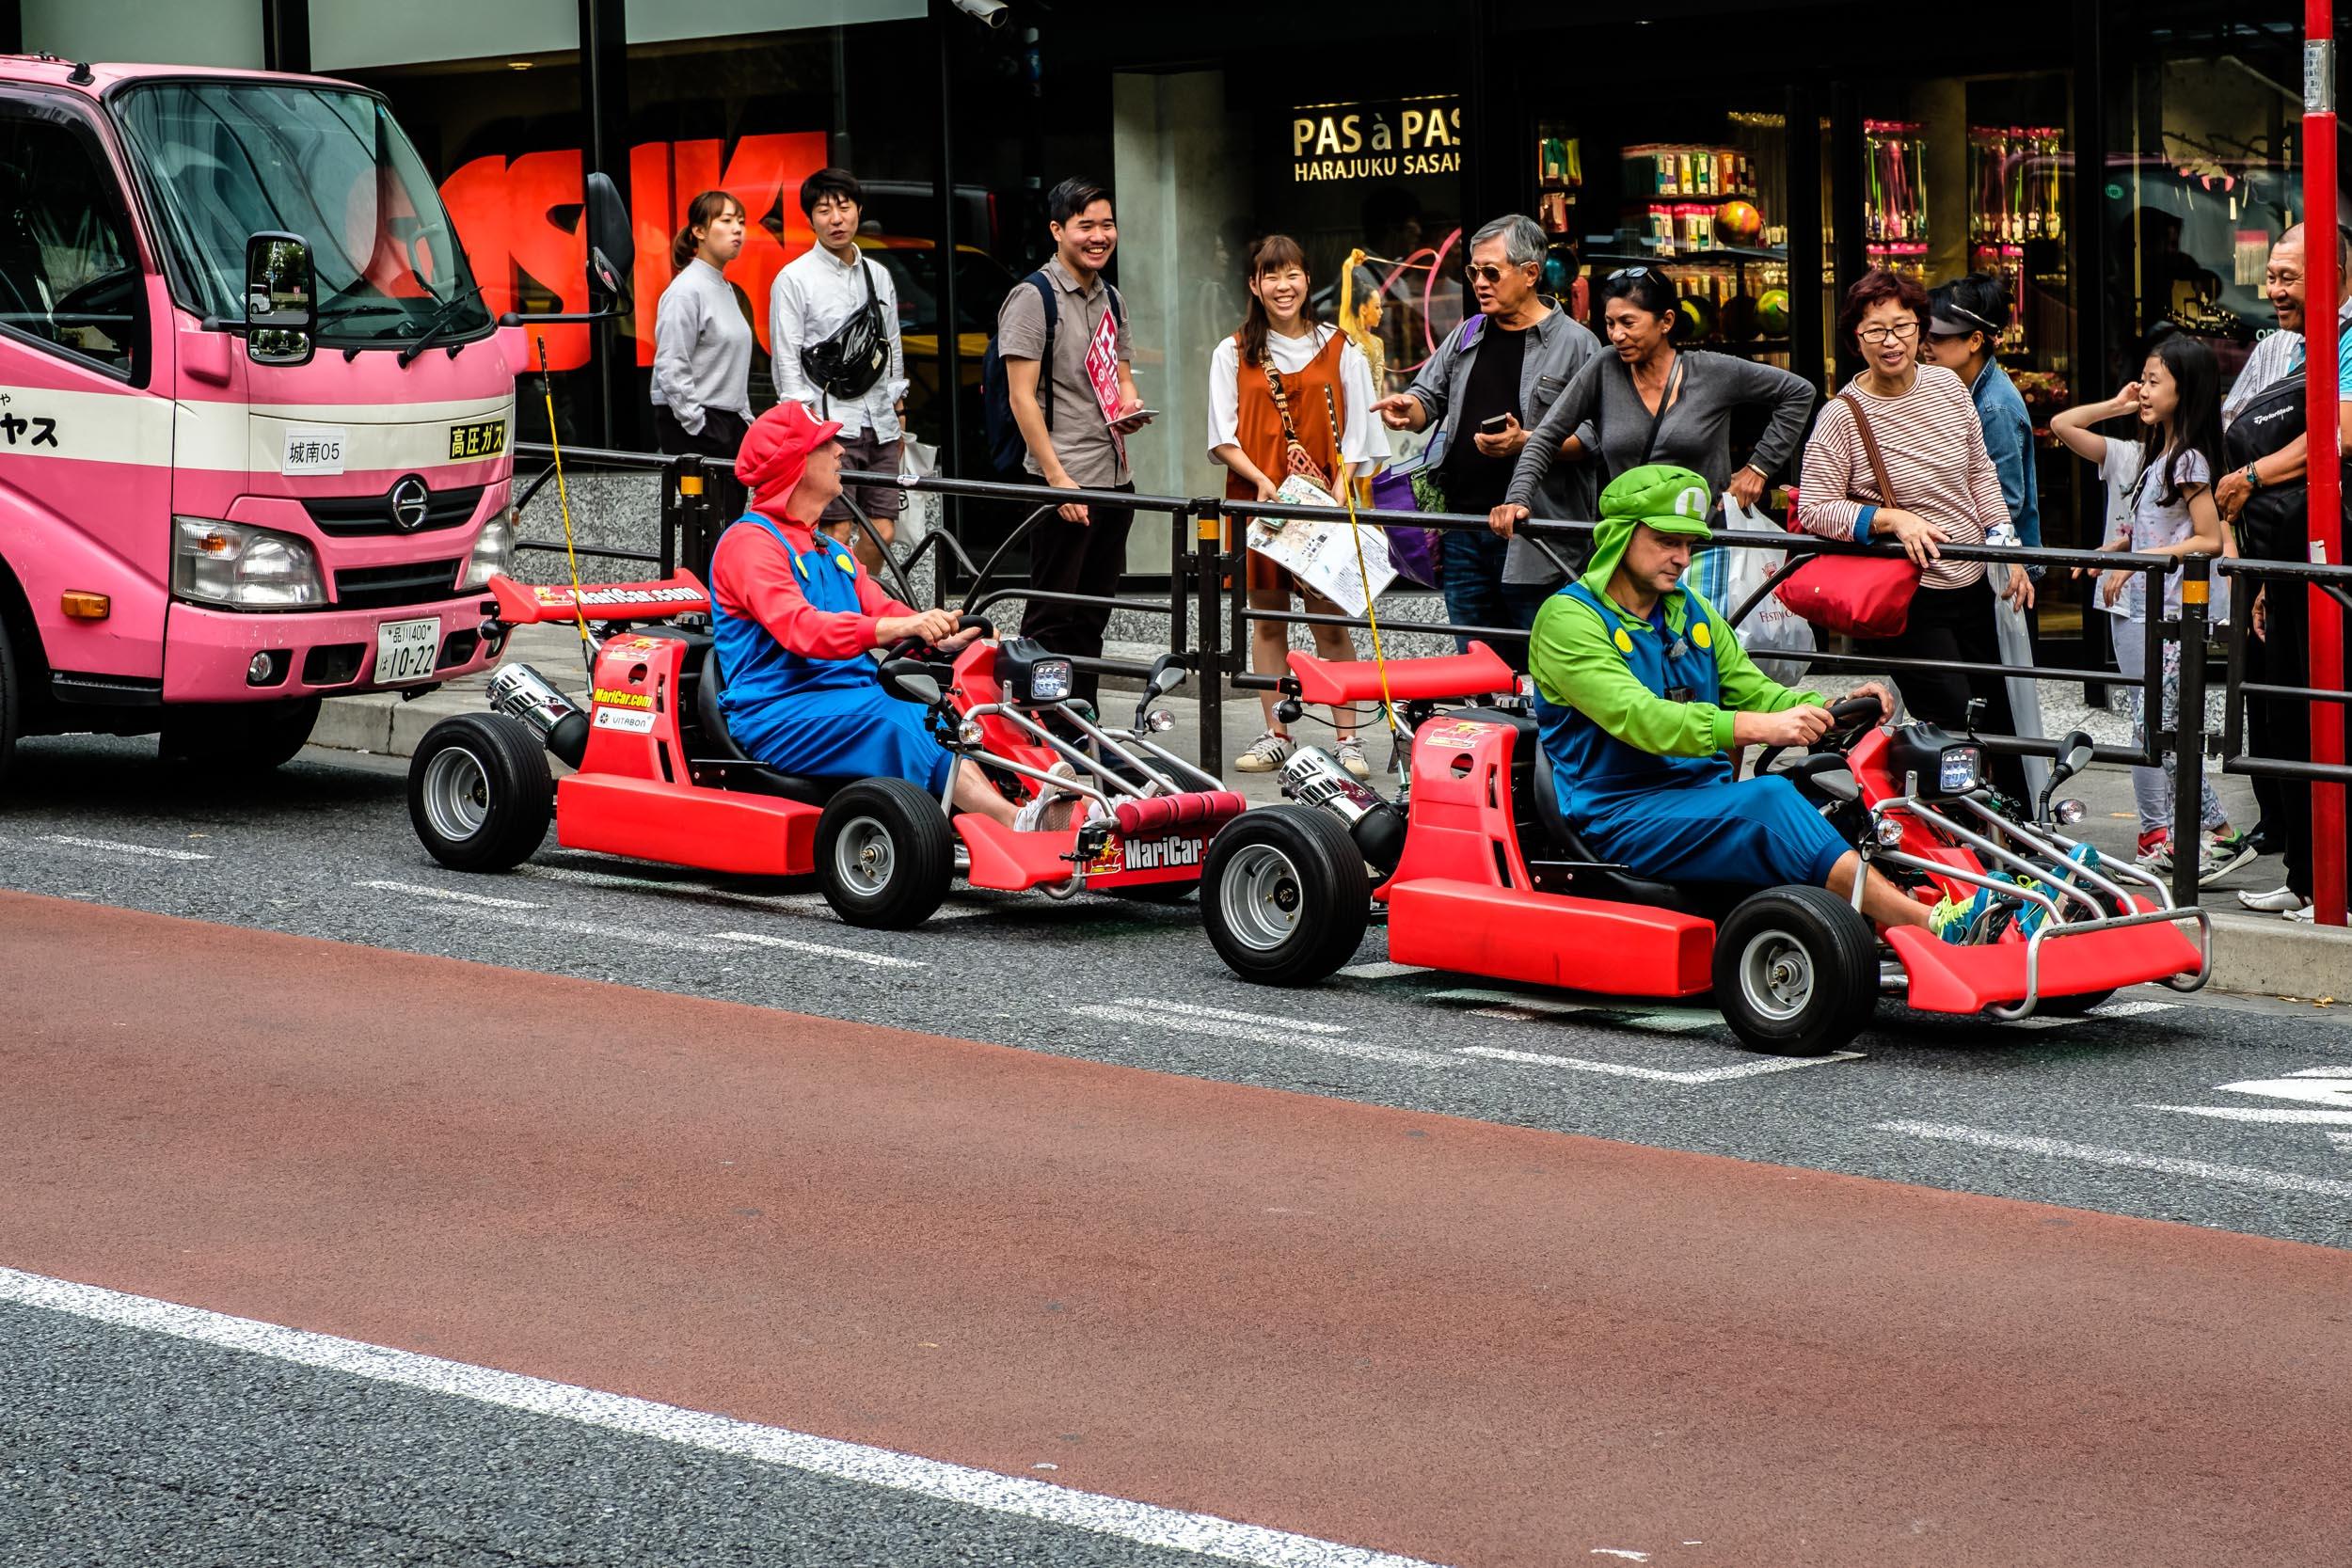 Two Marios karting in Harajuku